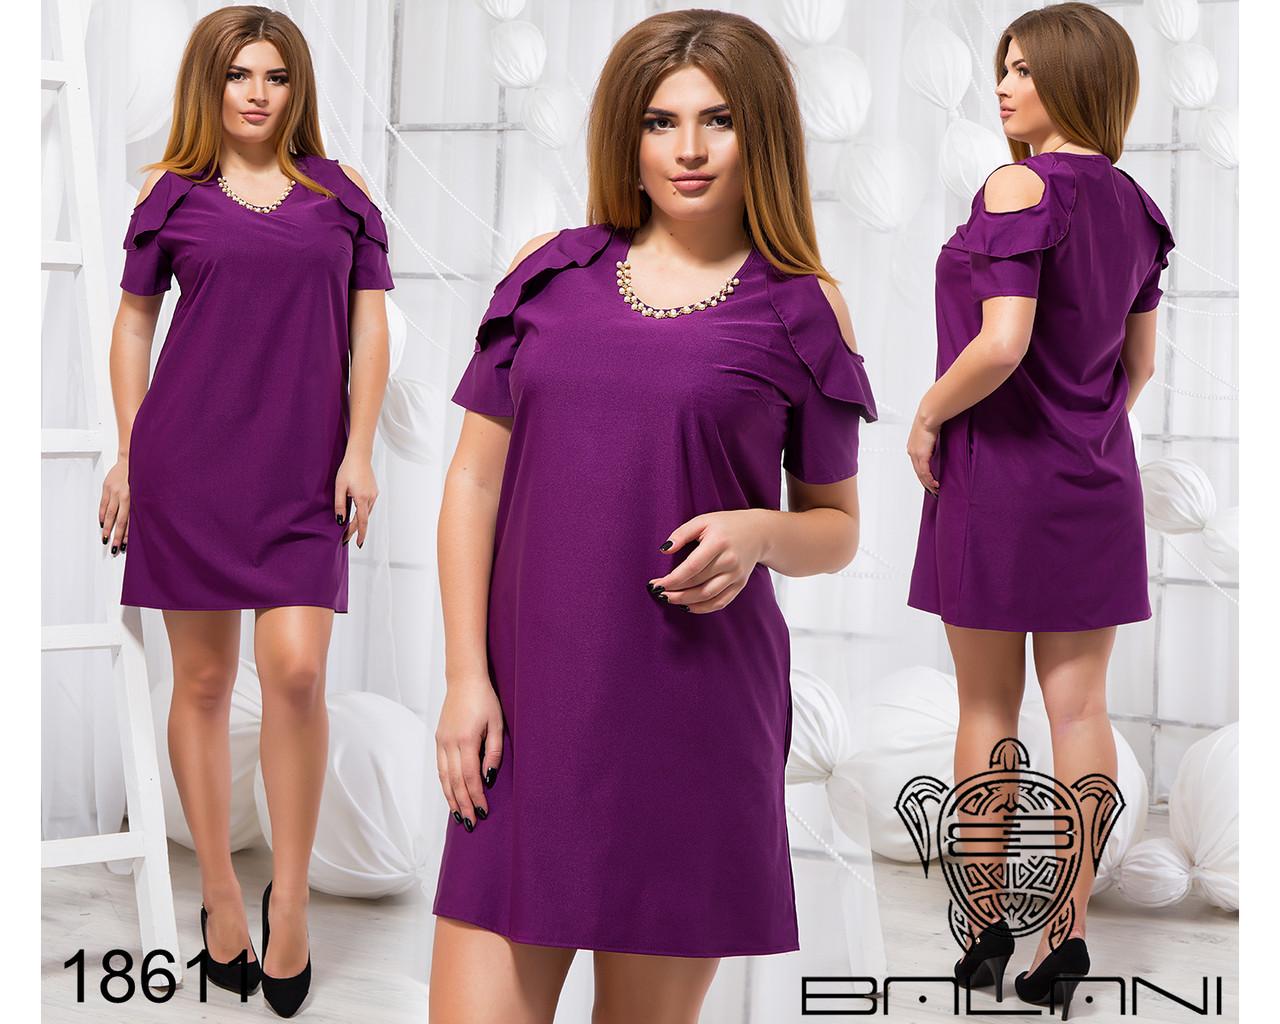 Эгегантное платье - 18611 фиолет/48